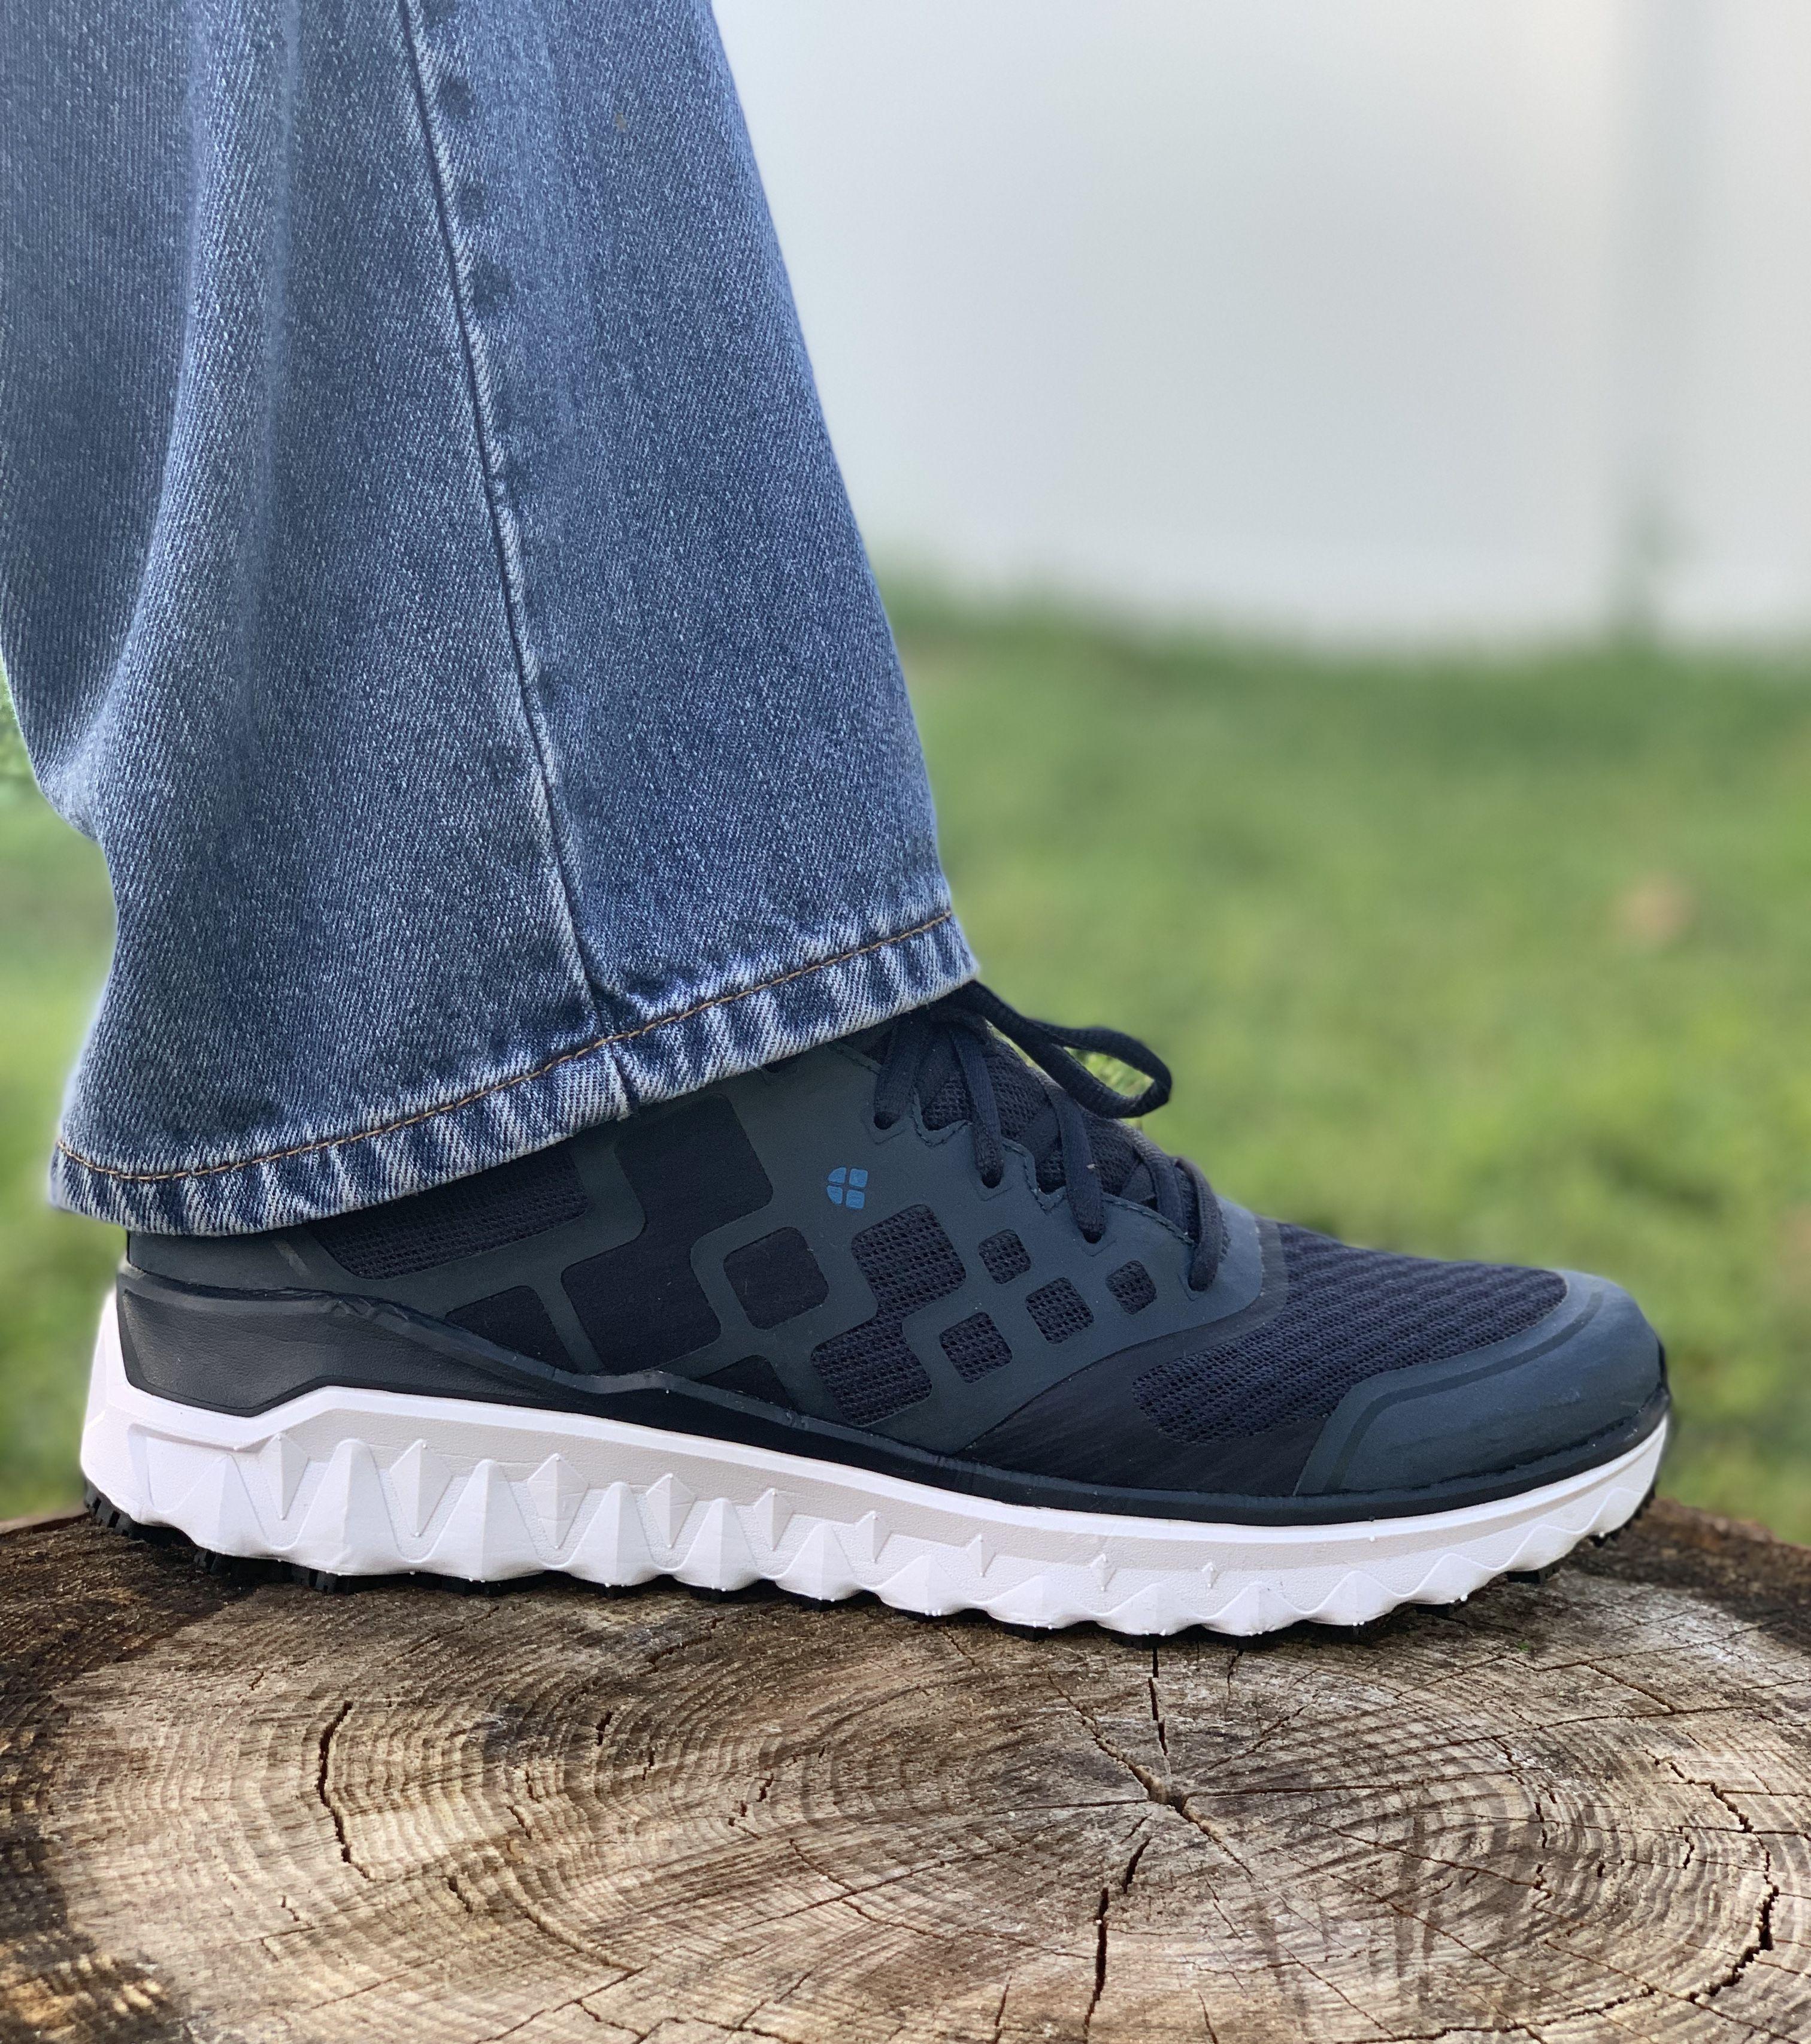 most comfortable men's athletic shoes